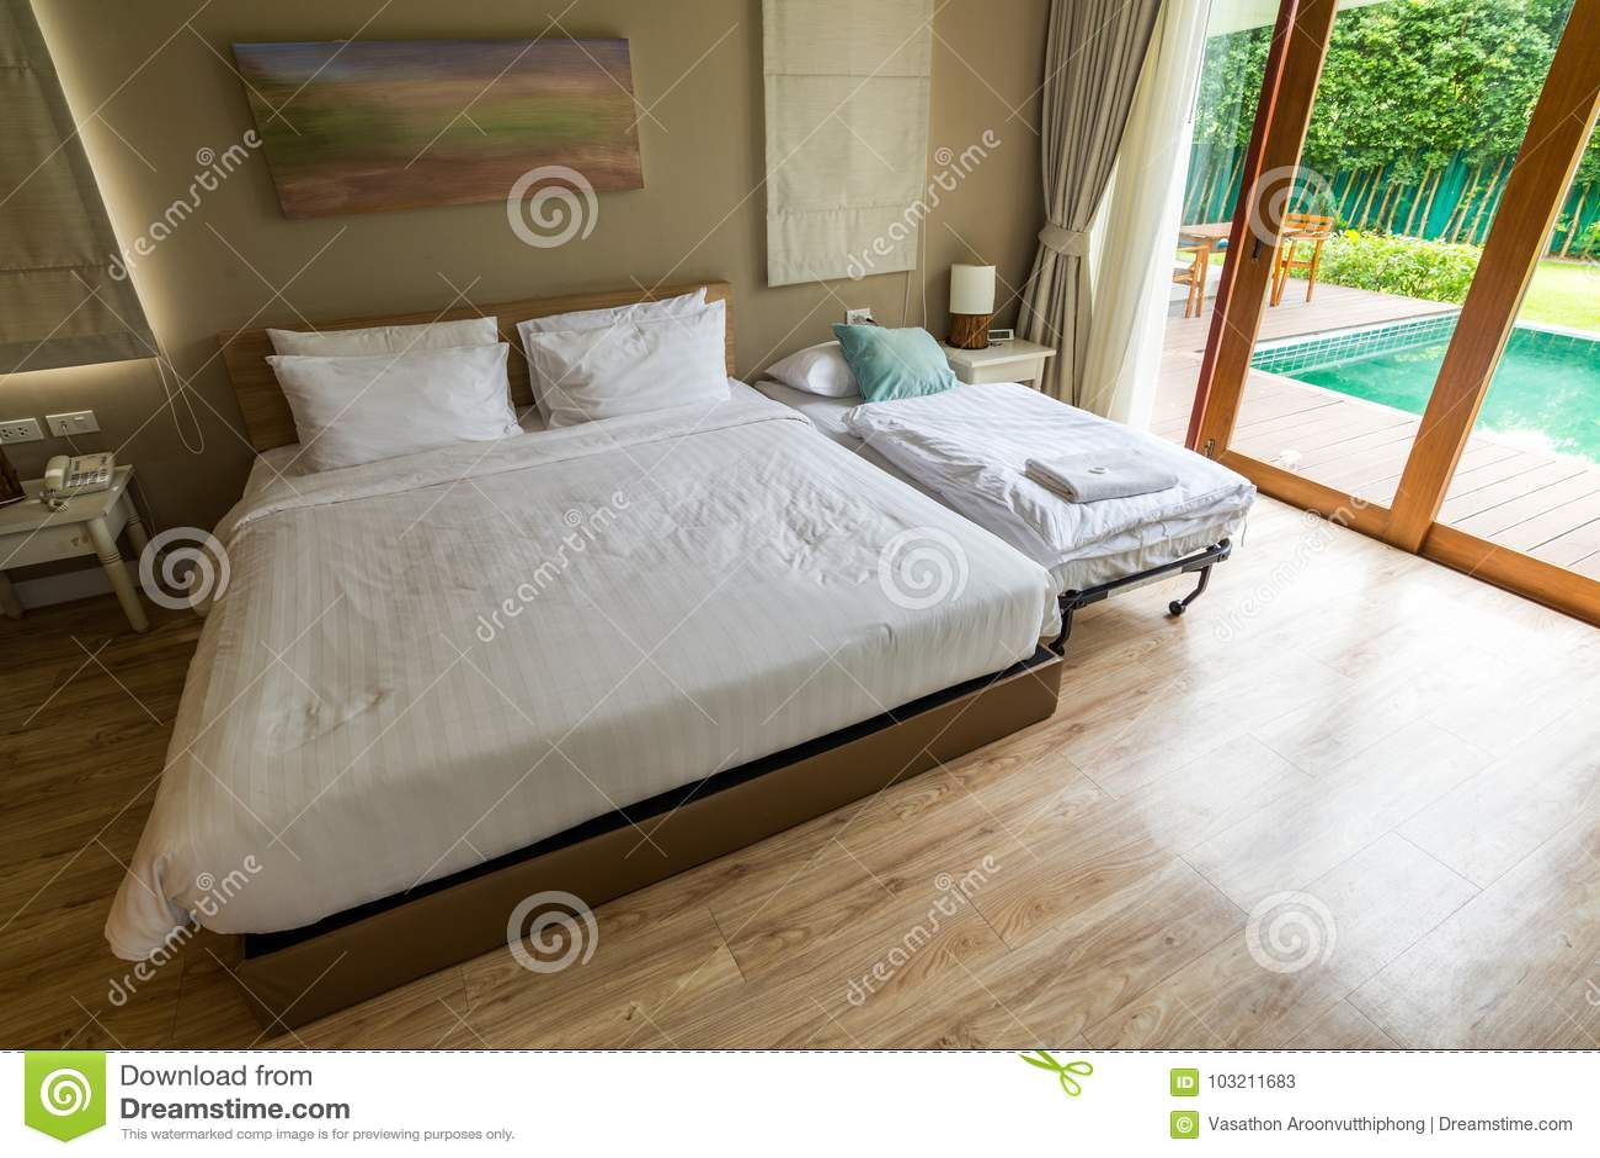 Houten Vloer Slaapkamer : Moderne witte slaapkamer op houten vloer stock afbeelding